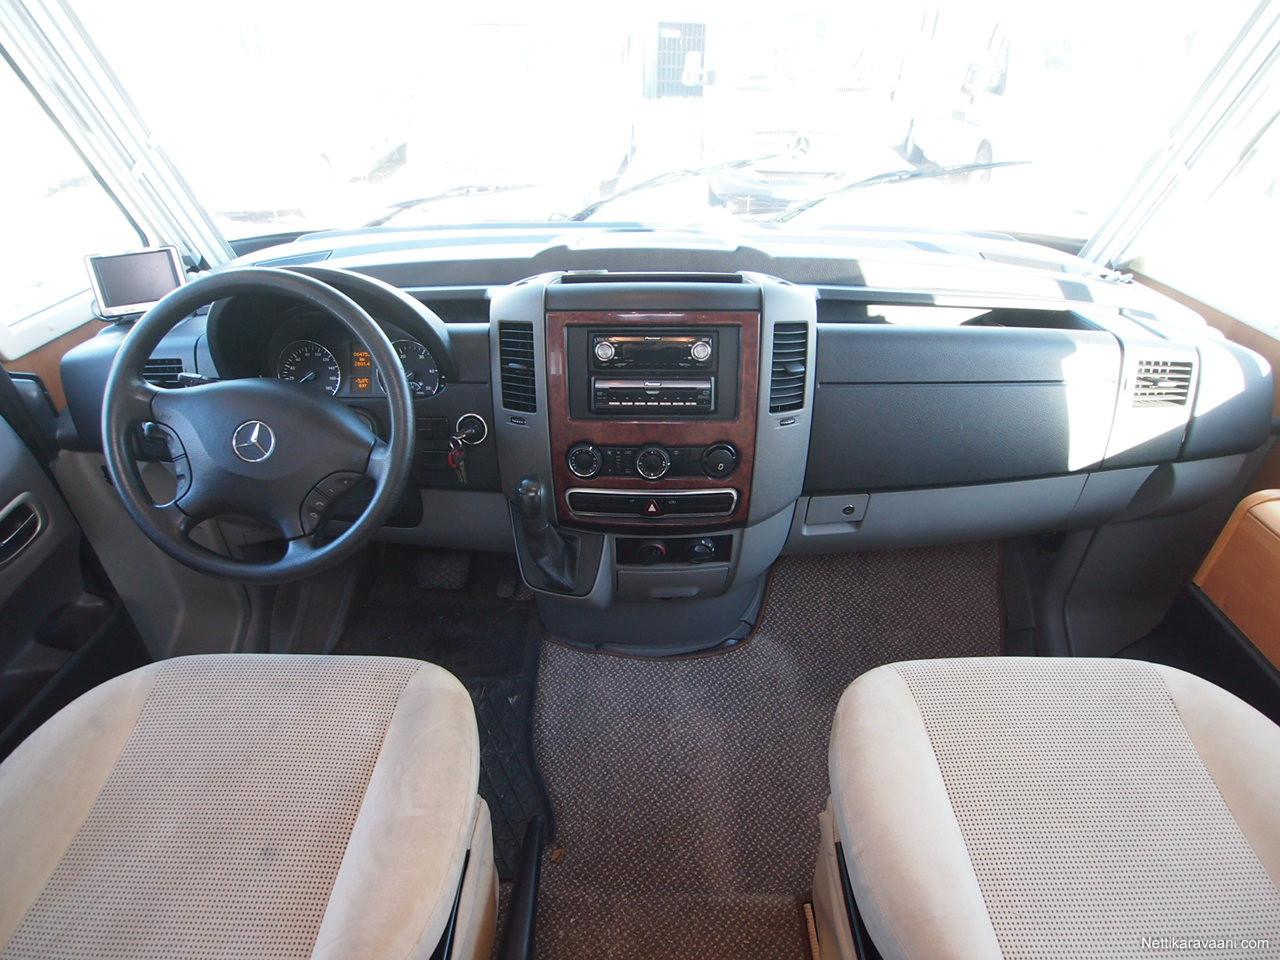 Rapido 966M MYYTY, Mercedes-Benz 315 CDI 2007 - Travel truck ...